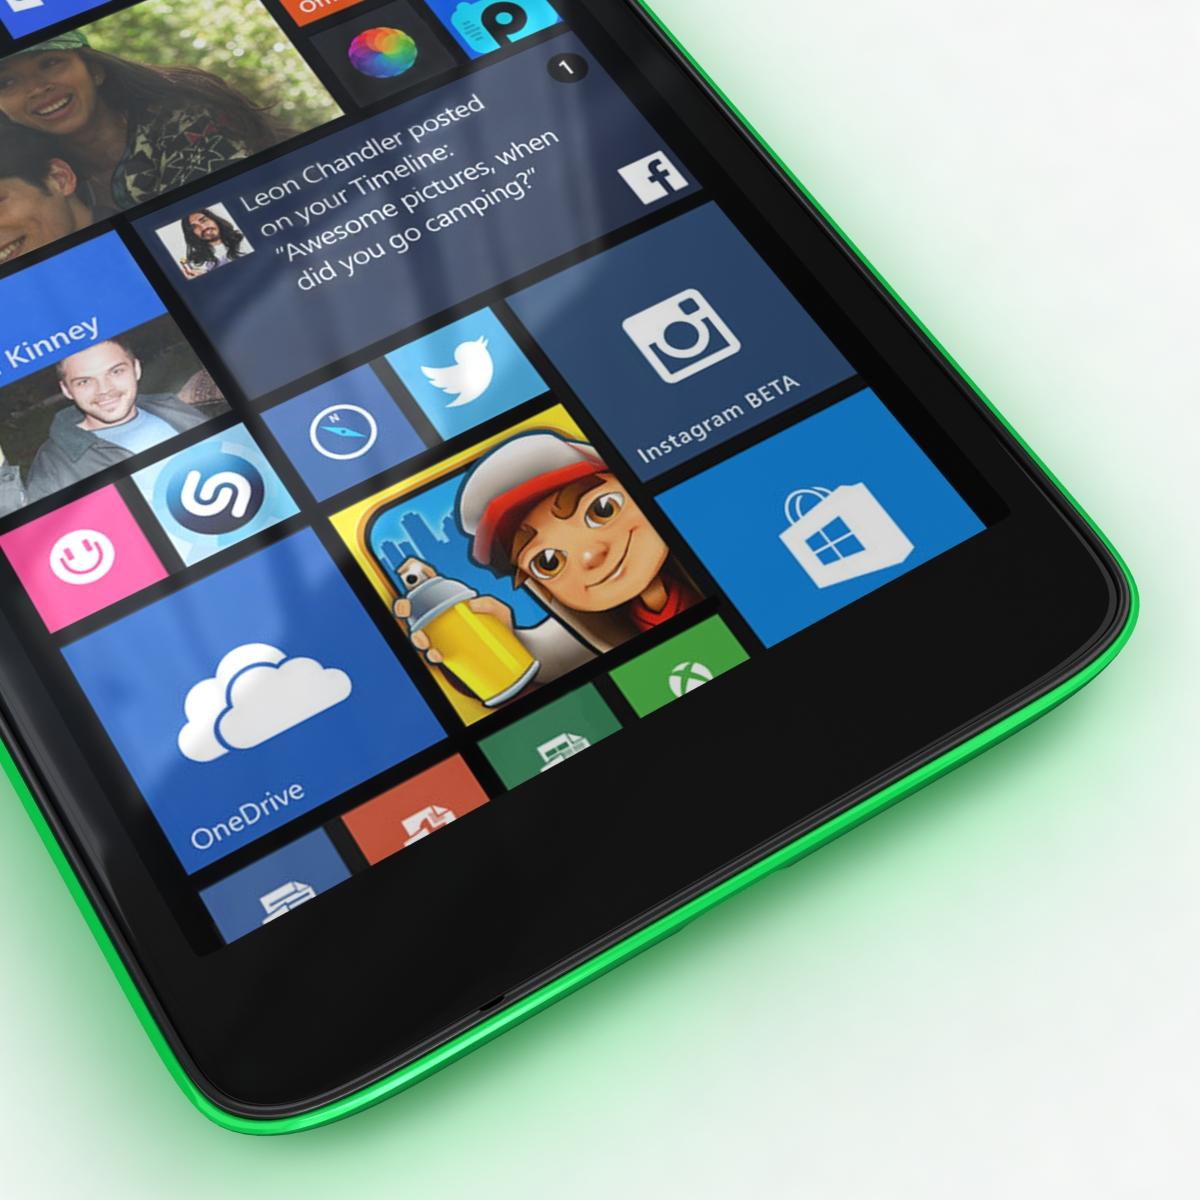 microsoft lumia 535 and dual sim green 3d model 3ds max fbx c4d obj 204171